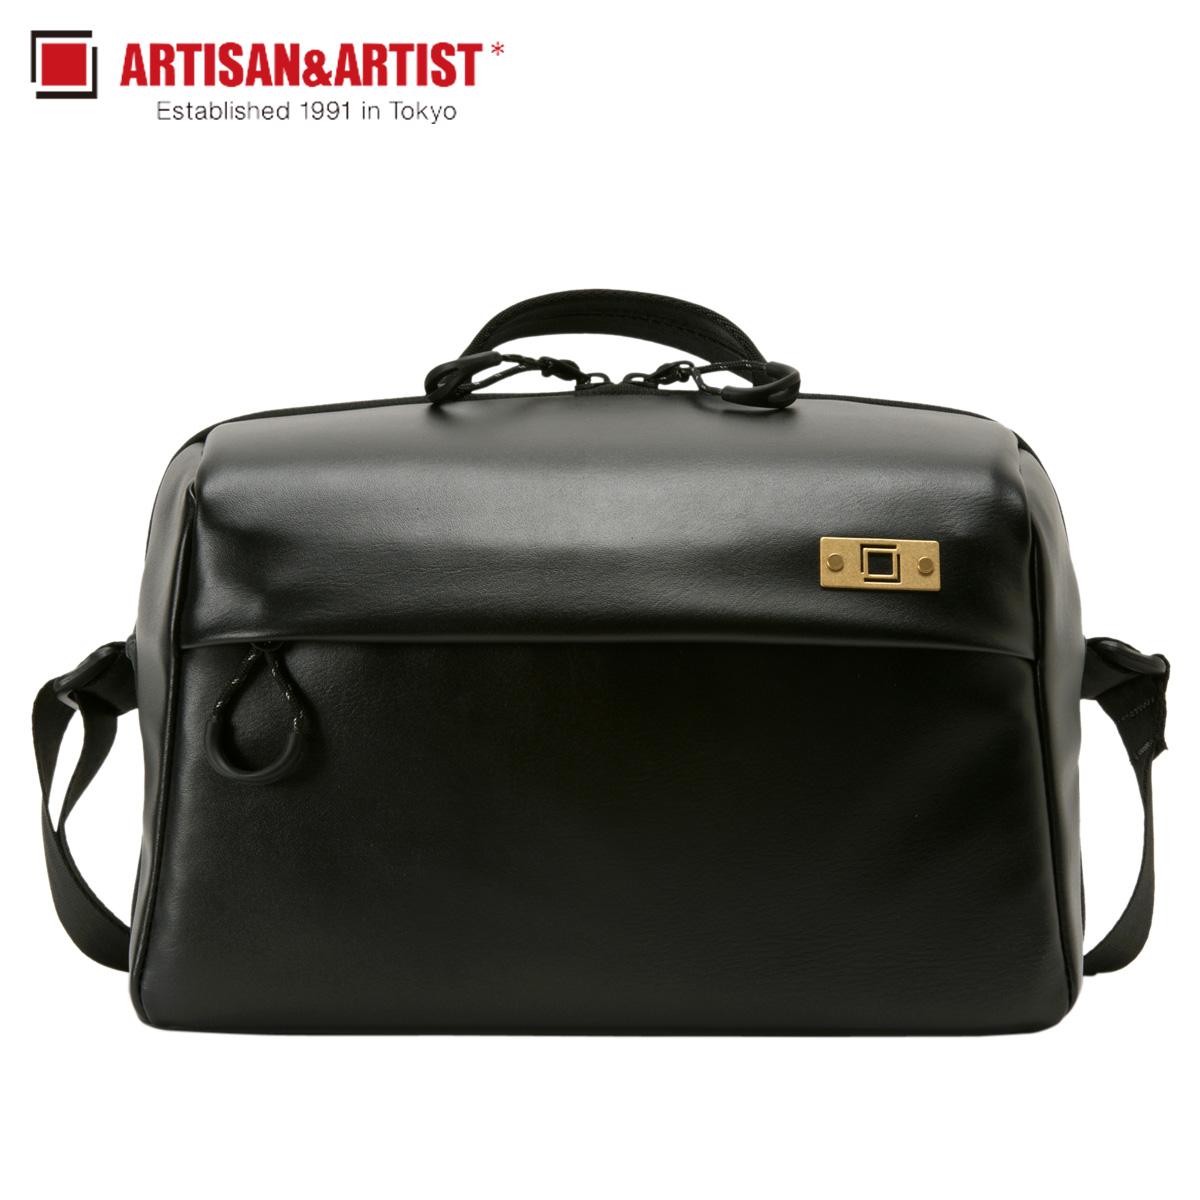 ARTISAN&ARTIST BASALT SLING BAG アルティザン&アーティスト ショルダーバッグ カメラバッグ バッグ メンズ ブラック 黒 ACAM-BS0003